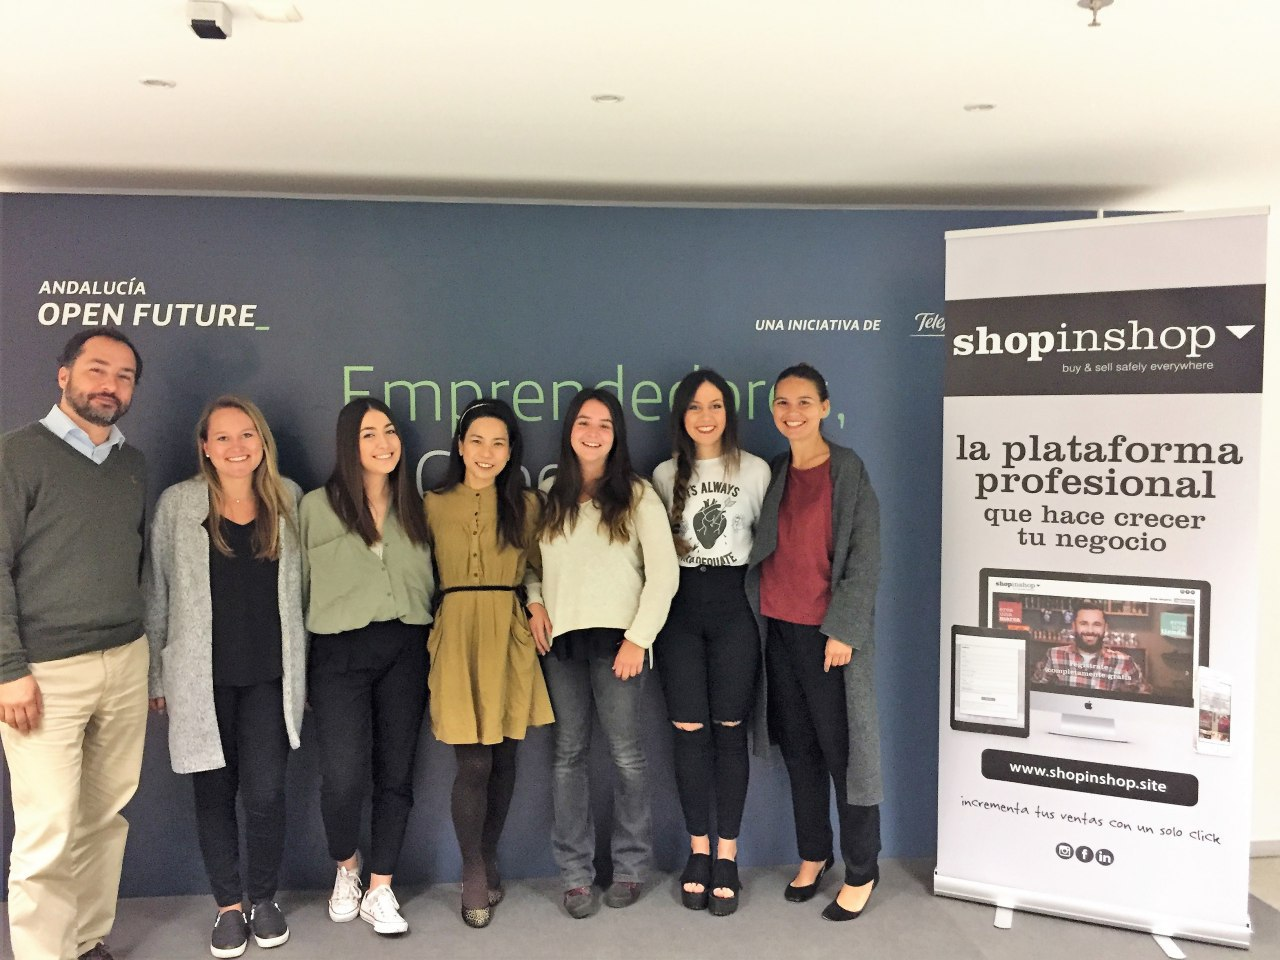 equipo-shopinshop-andalucia-open-future